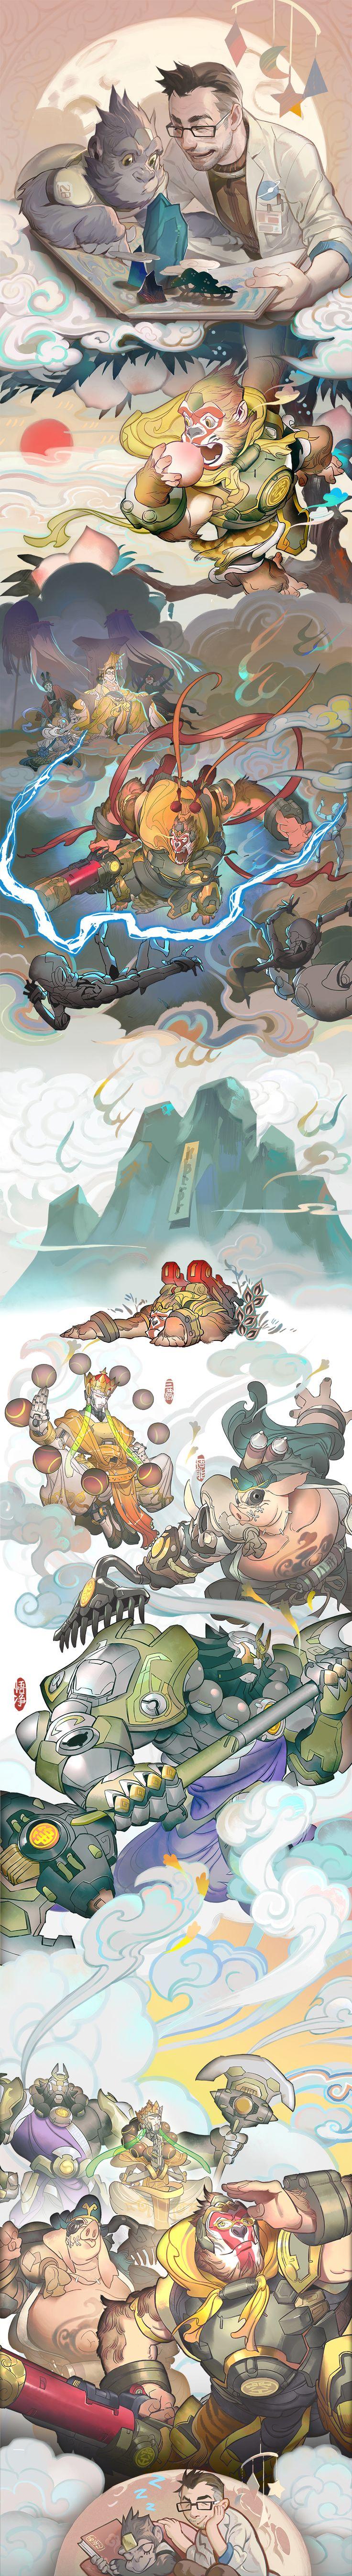 Overwatch - Winston Shīnto Illustration